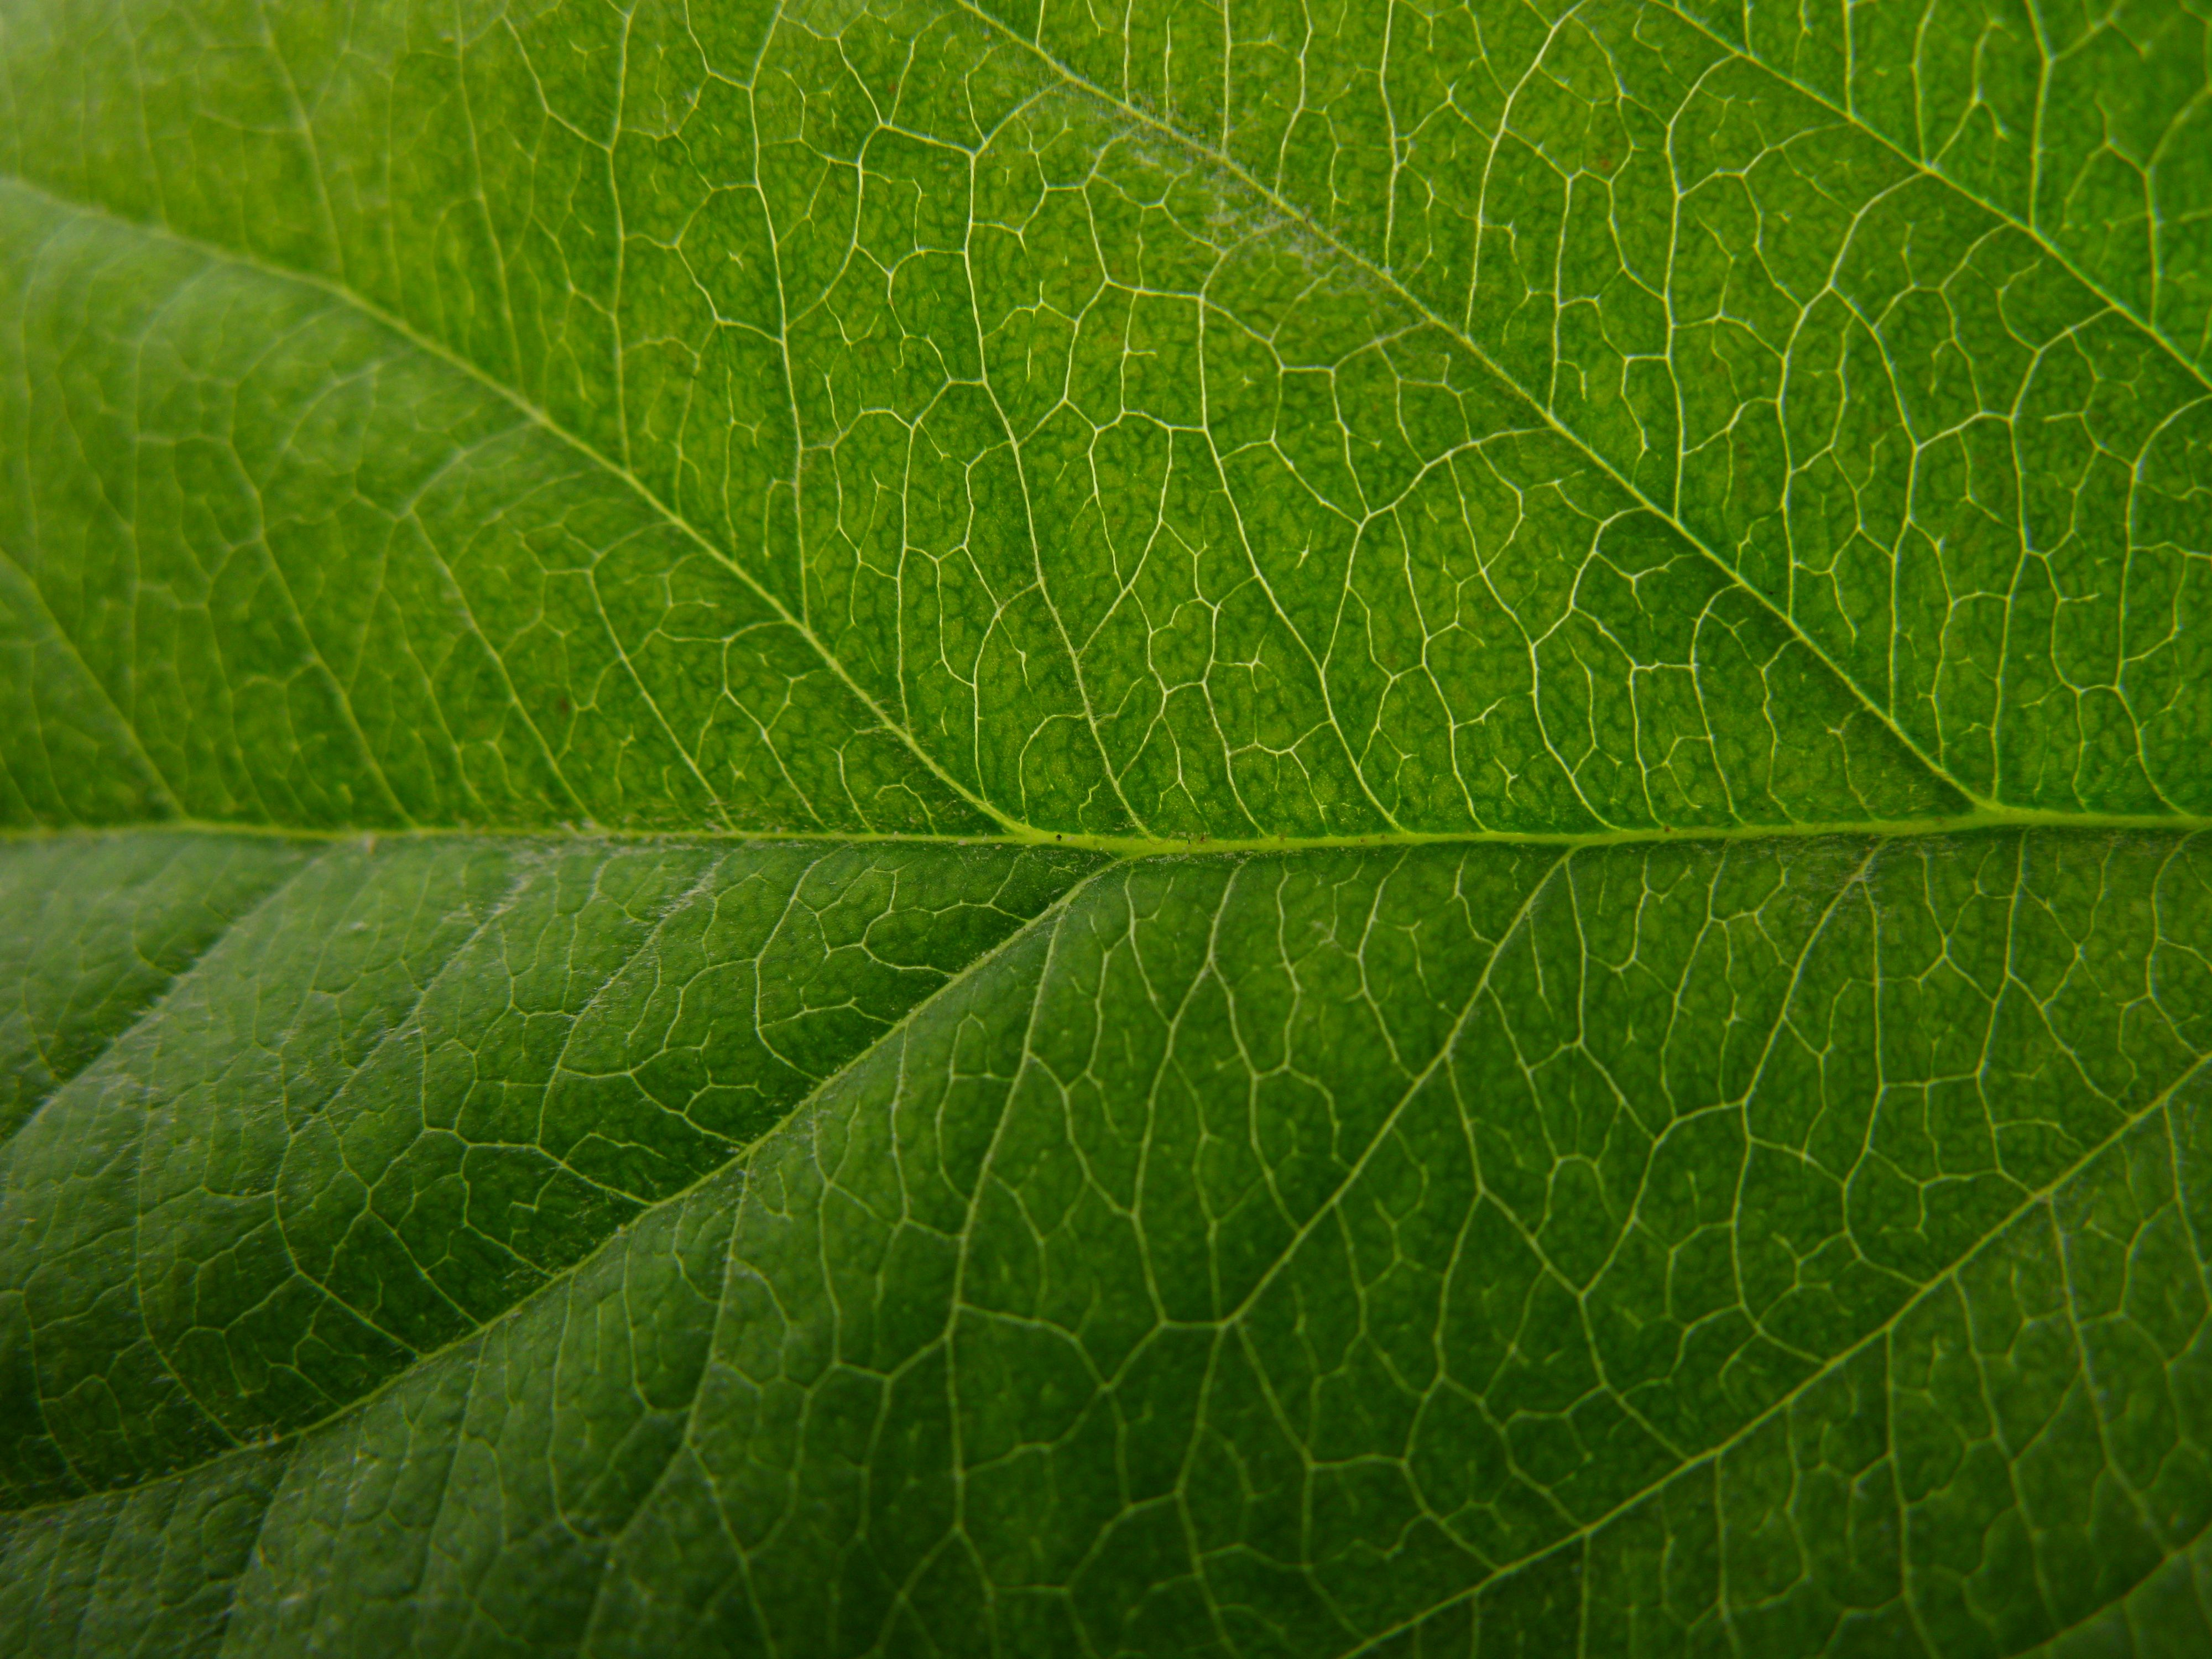 Apple Leaf Texture   Leaf texture, Plants, Texture